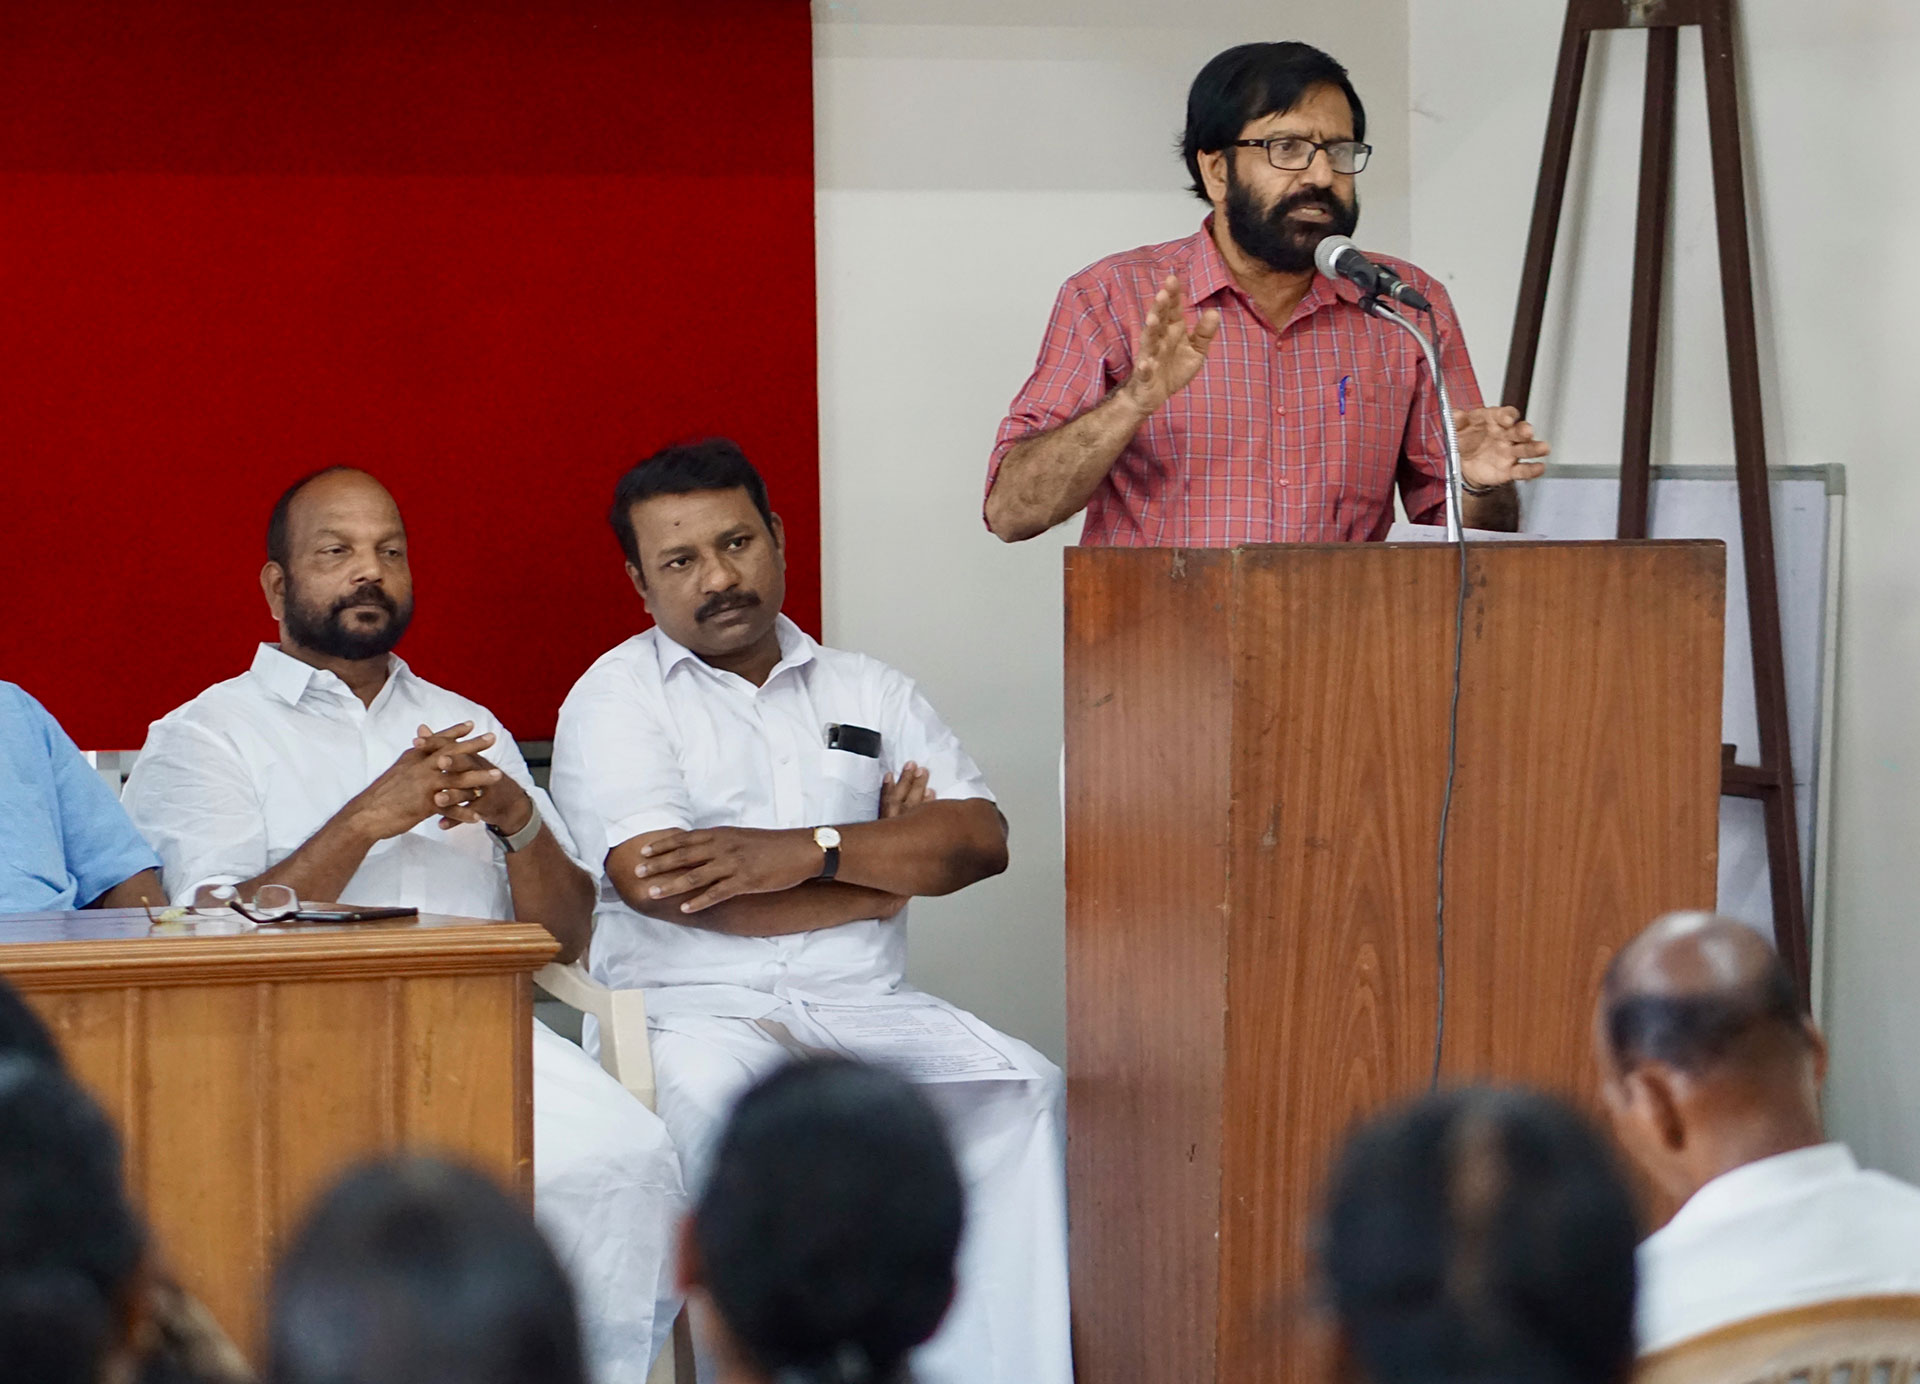 K.P. Ramanunni gives a speech honoring a Dalit leader in Kozhikode. (Photo by Krishna Narayanamurti)